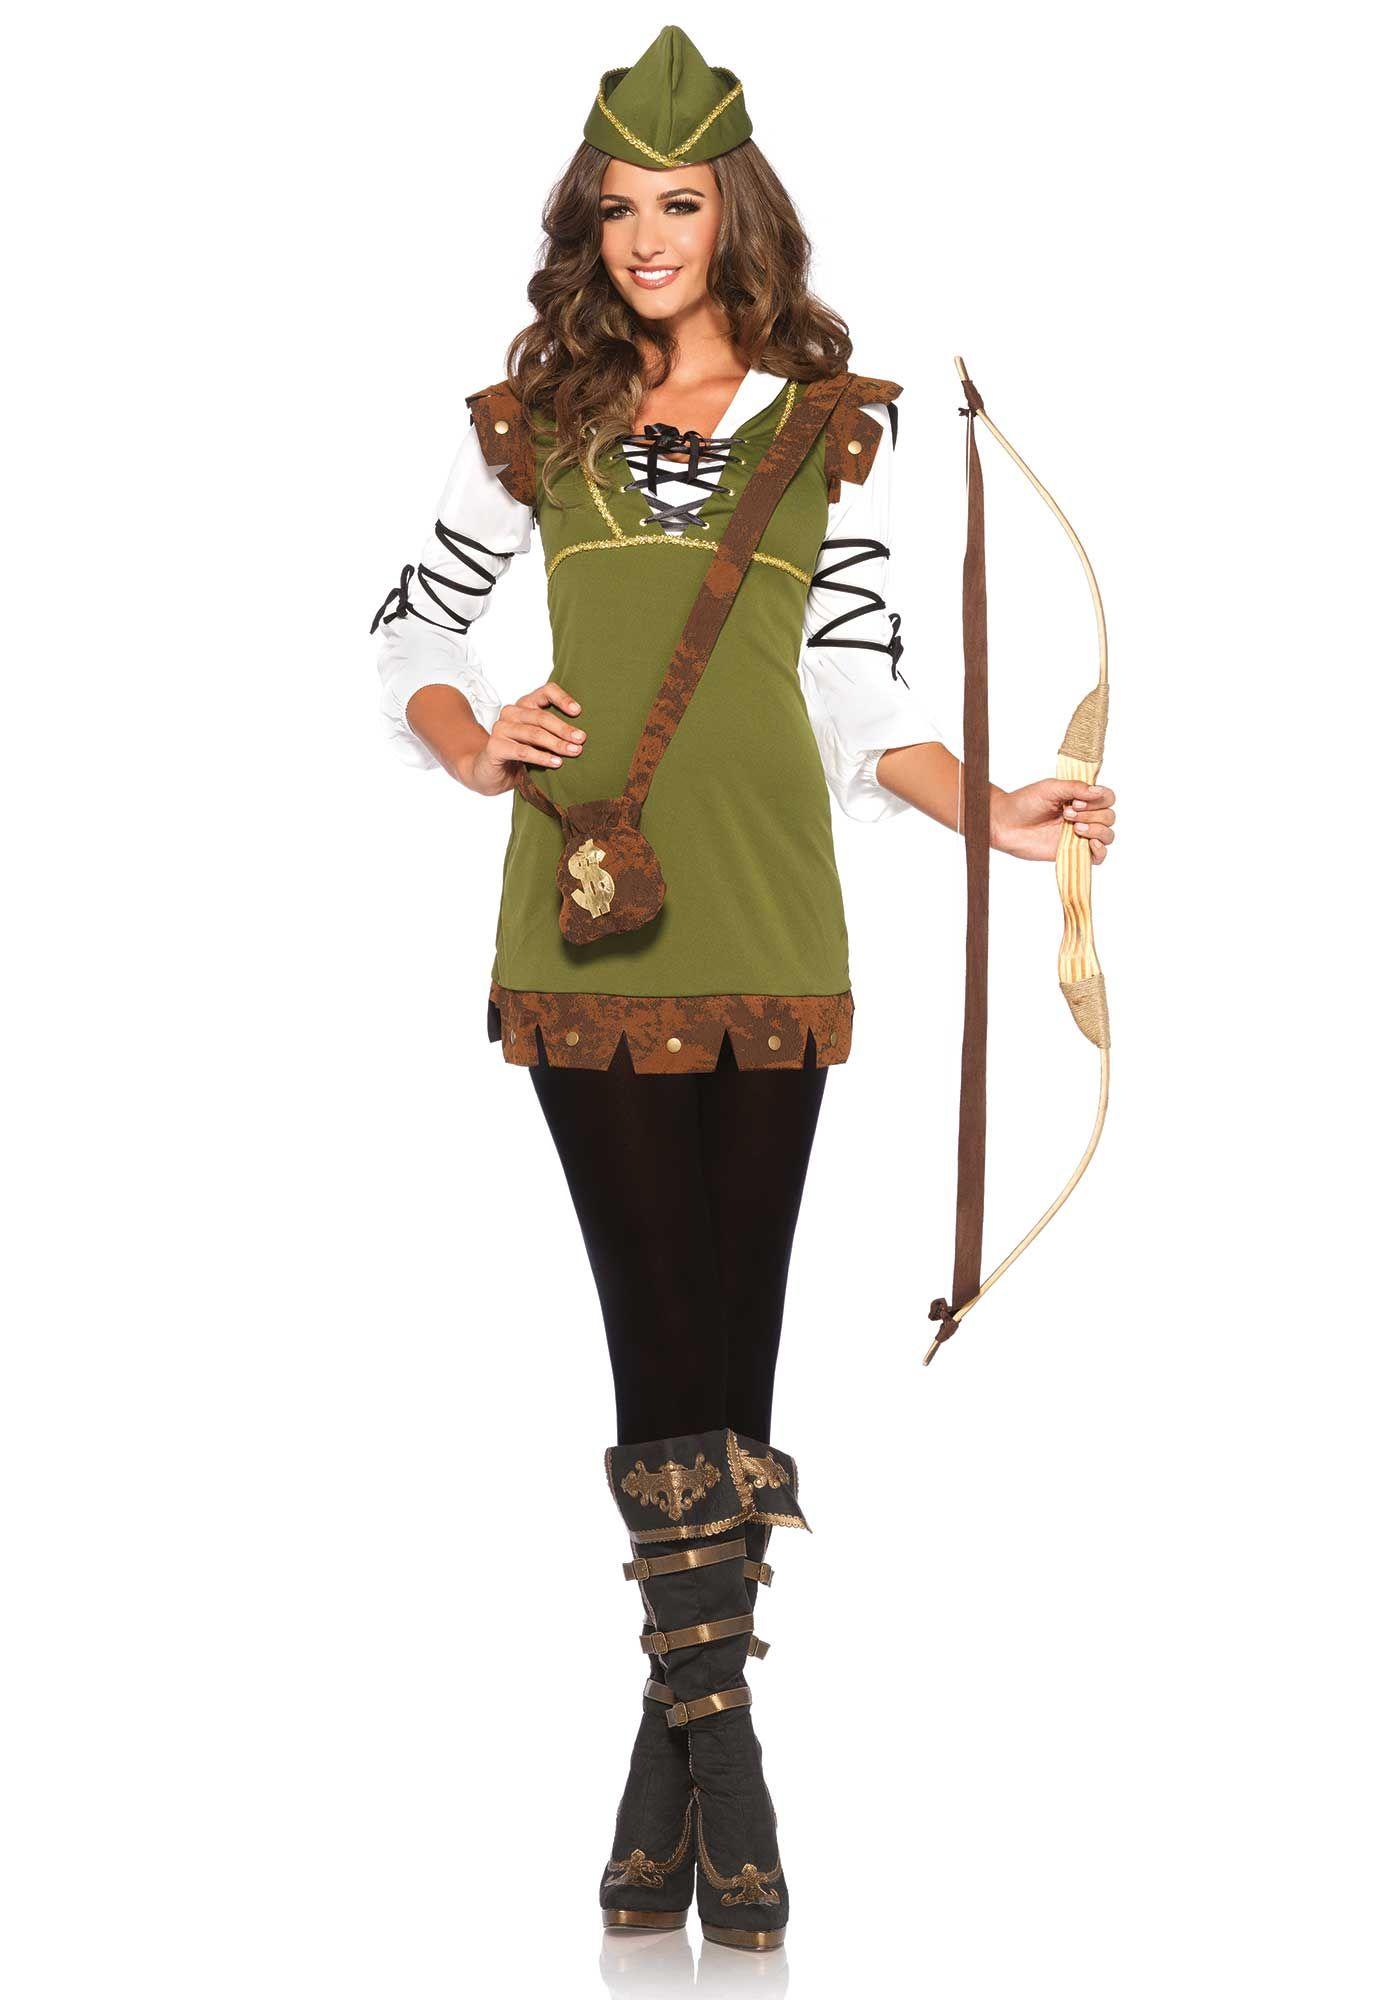 2643b15e2417b Leg Avenue Classic Robin Hood Costume #Fairytale #Disney #Hunter #Forrest  #English #Traditional